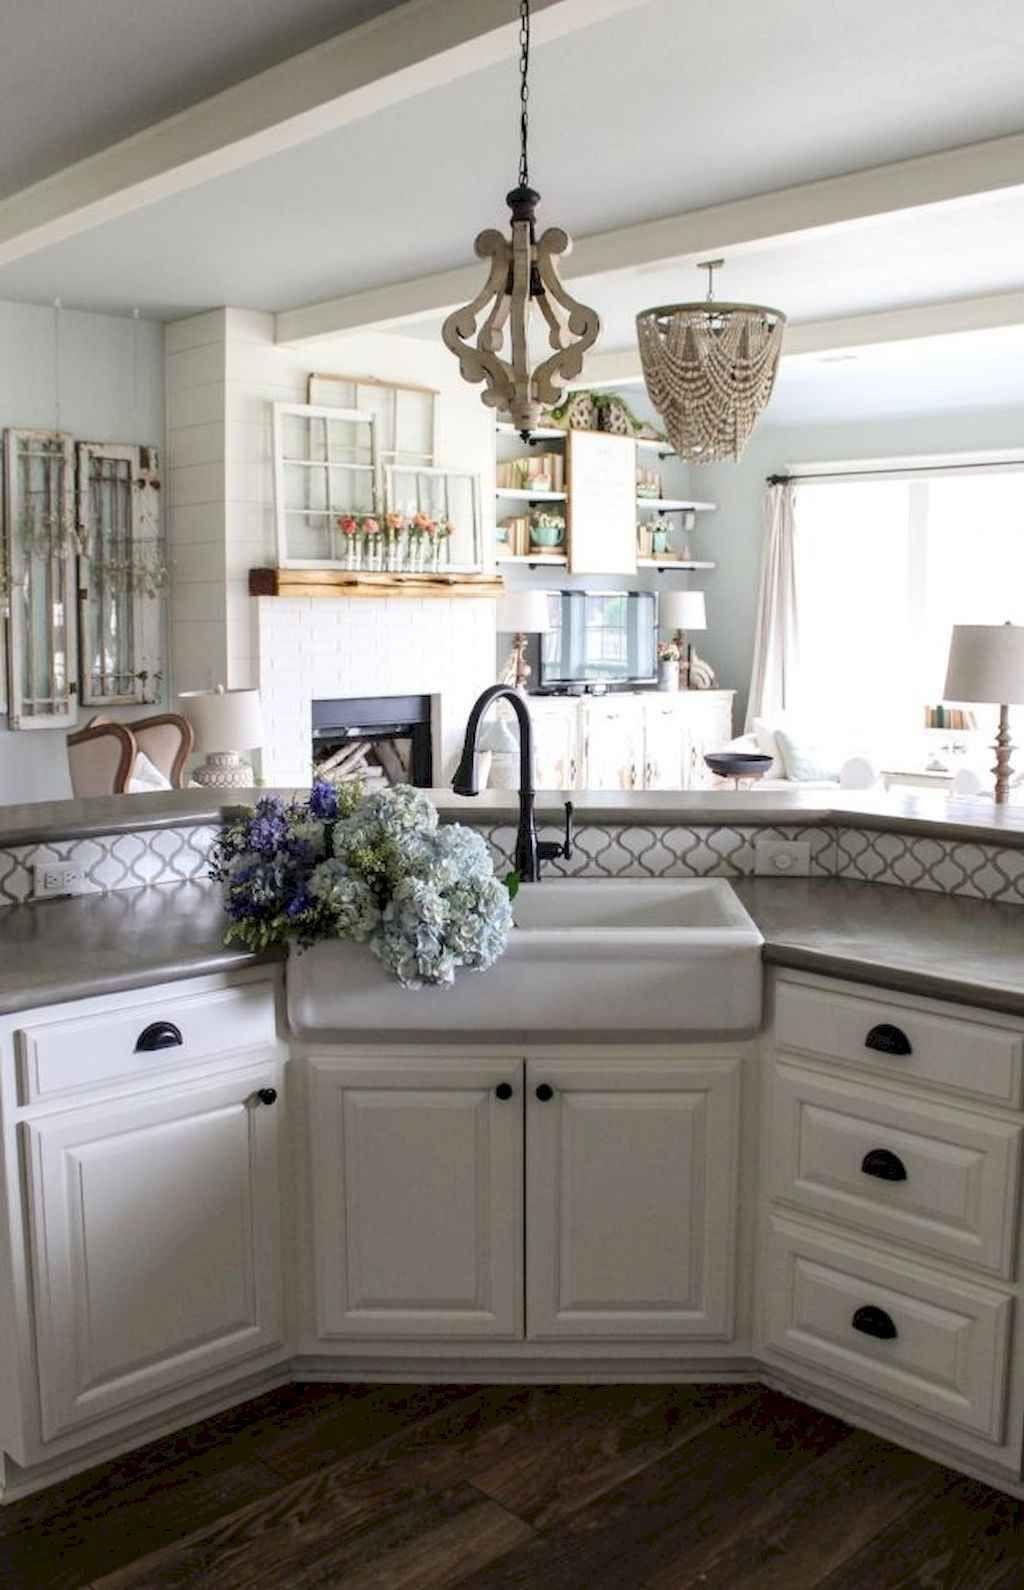 70 Modern Farmhouse Kitchen Sink Decor Ideas Diy kitchen